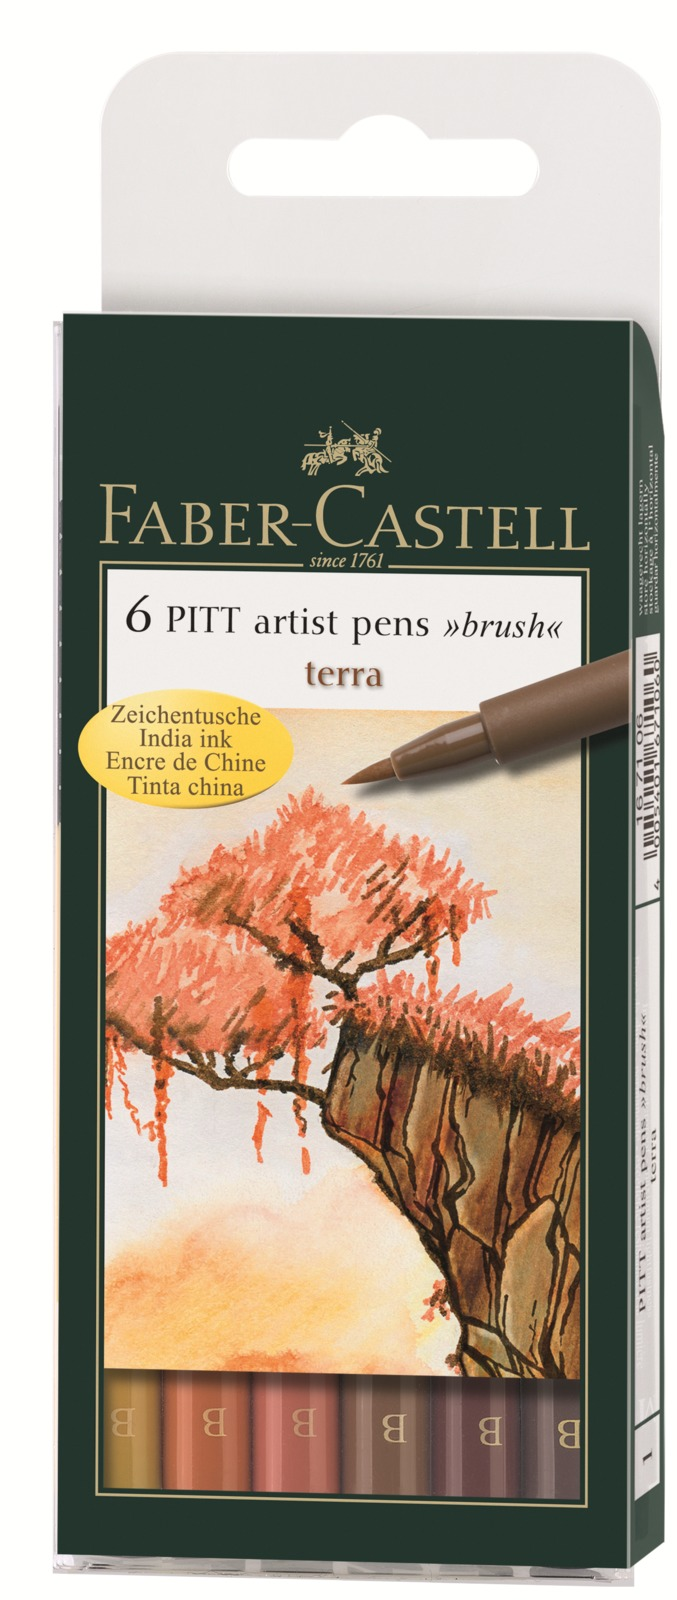 Faber-Castell: Pitt Artist Pens B Terra (Wallet of 6) image